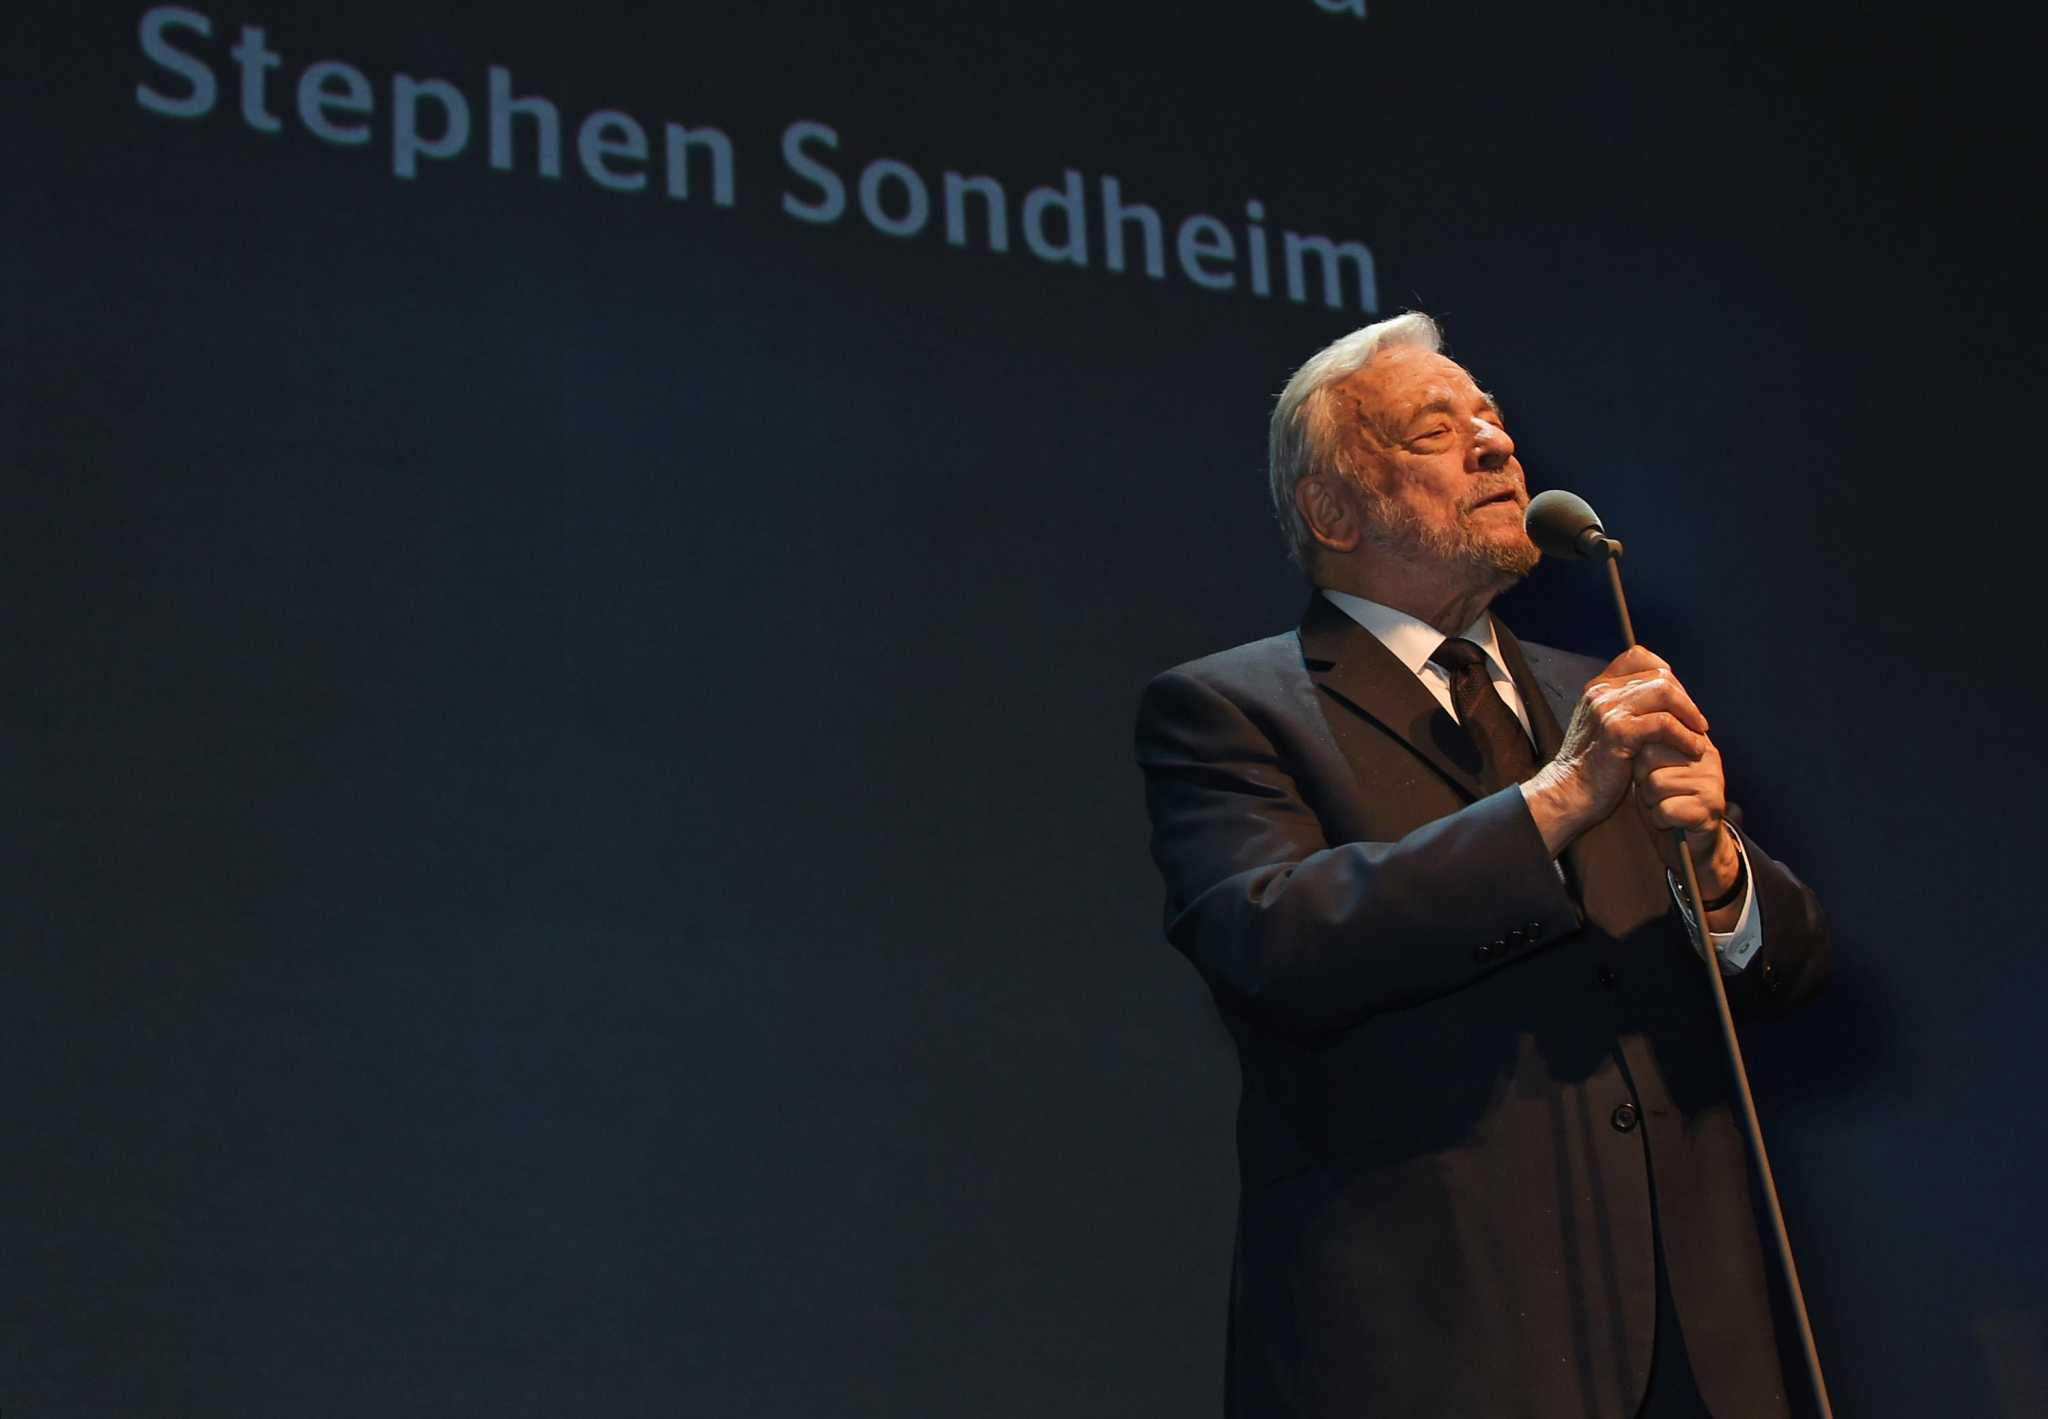 Curtain Call: Composer Stephen Sondheim attends Warner Theatre's production of 'Assassins'